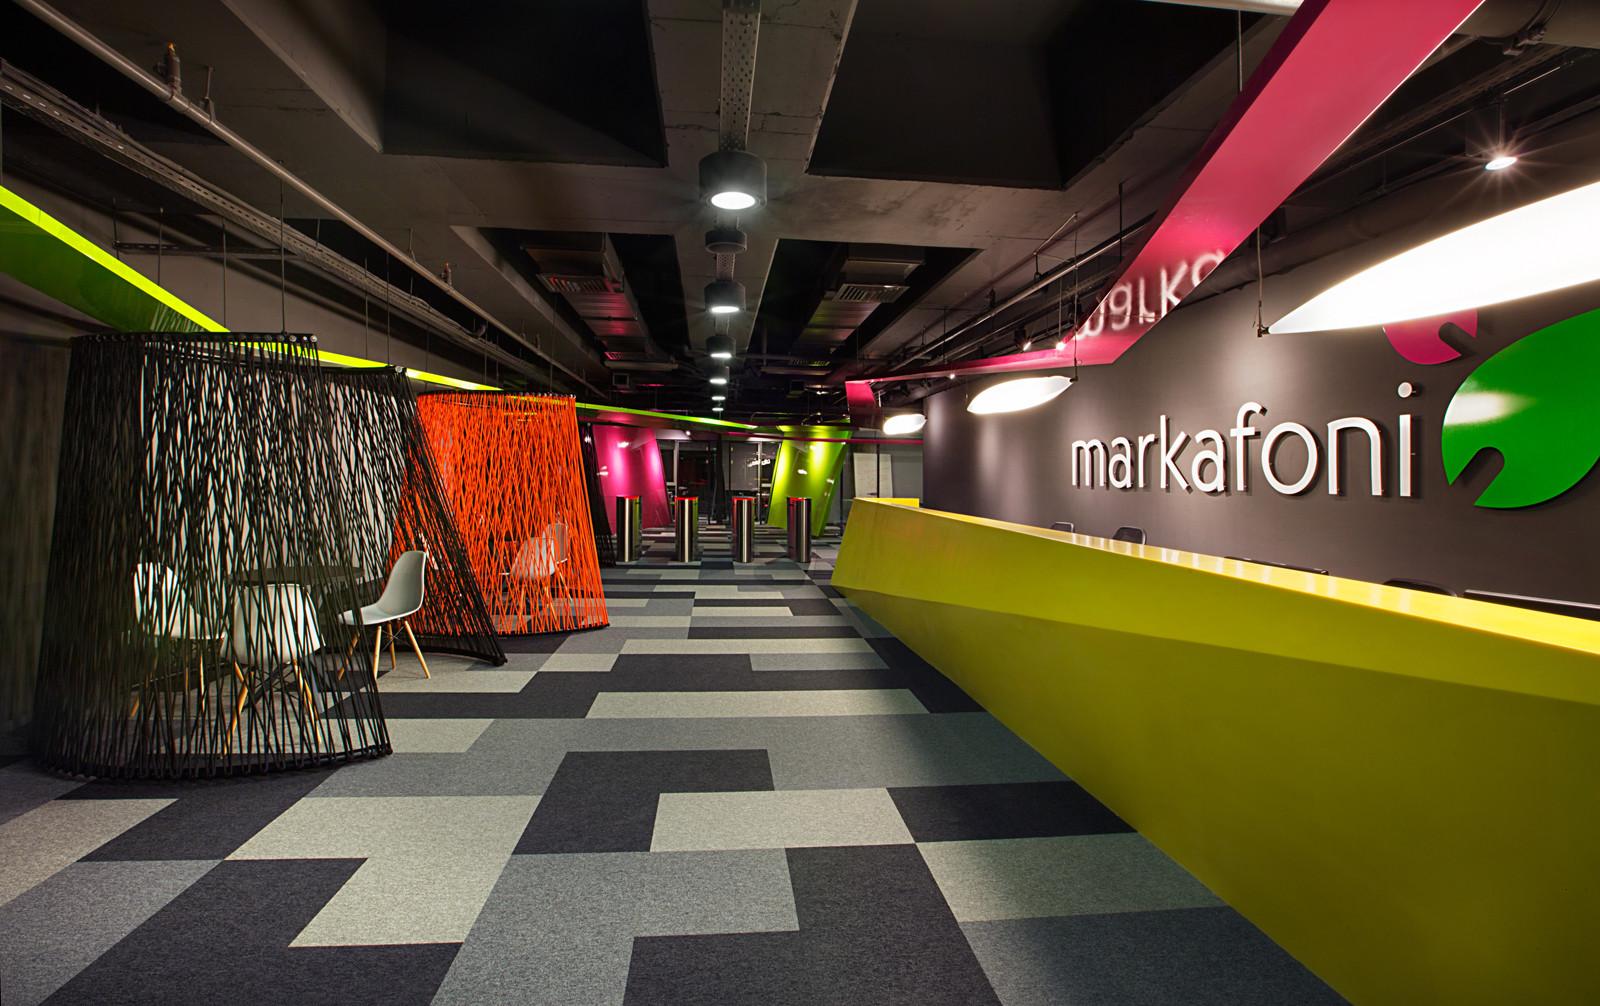 Markafoni.com Headquarters / Habif Architecture, © Gürkan Akay